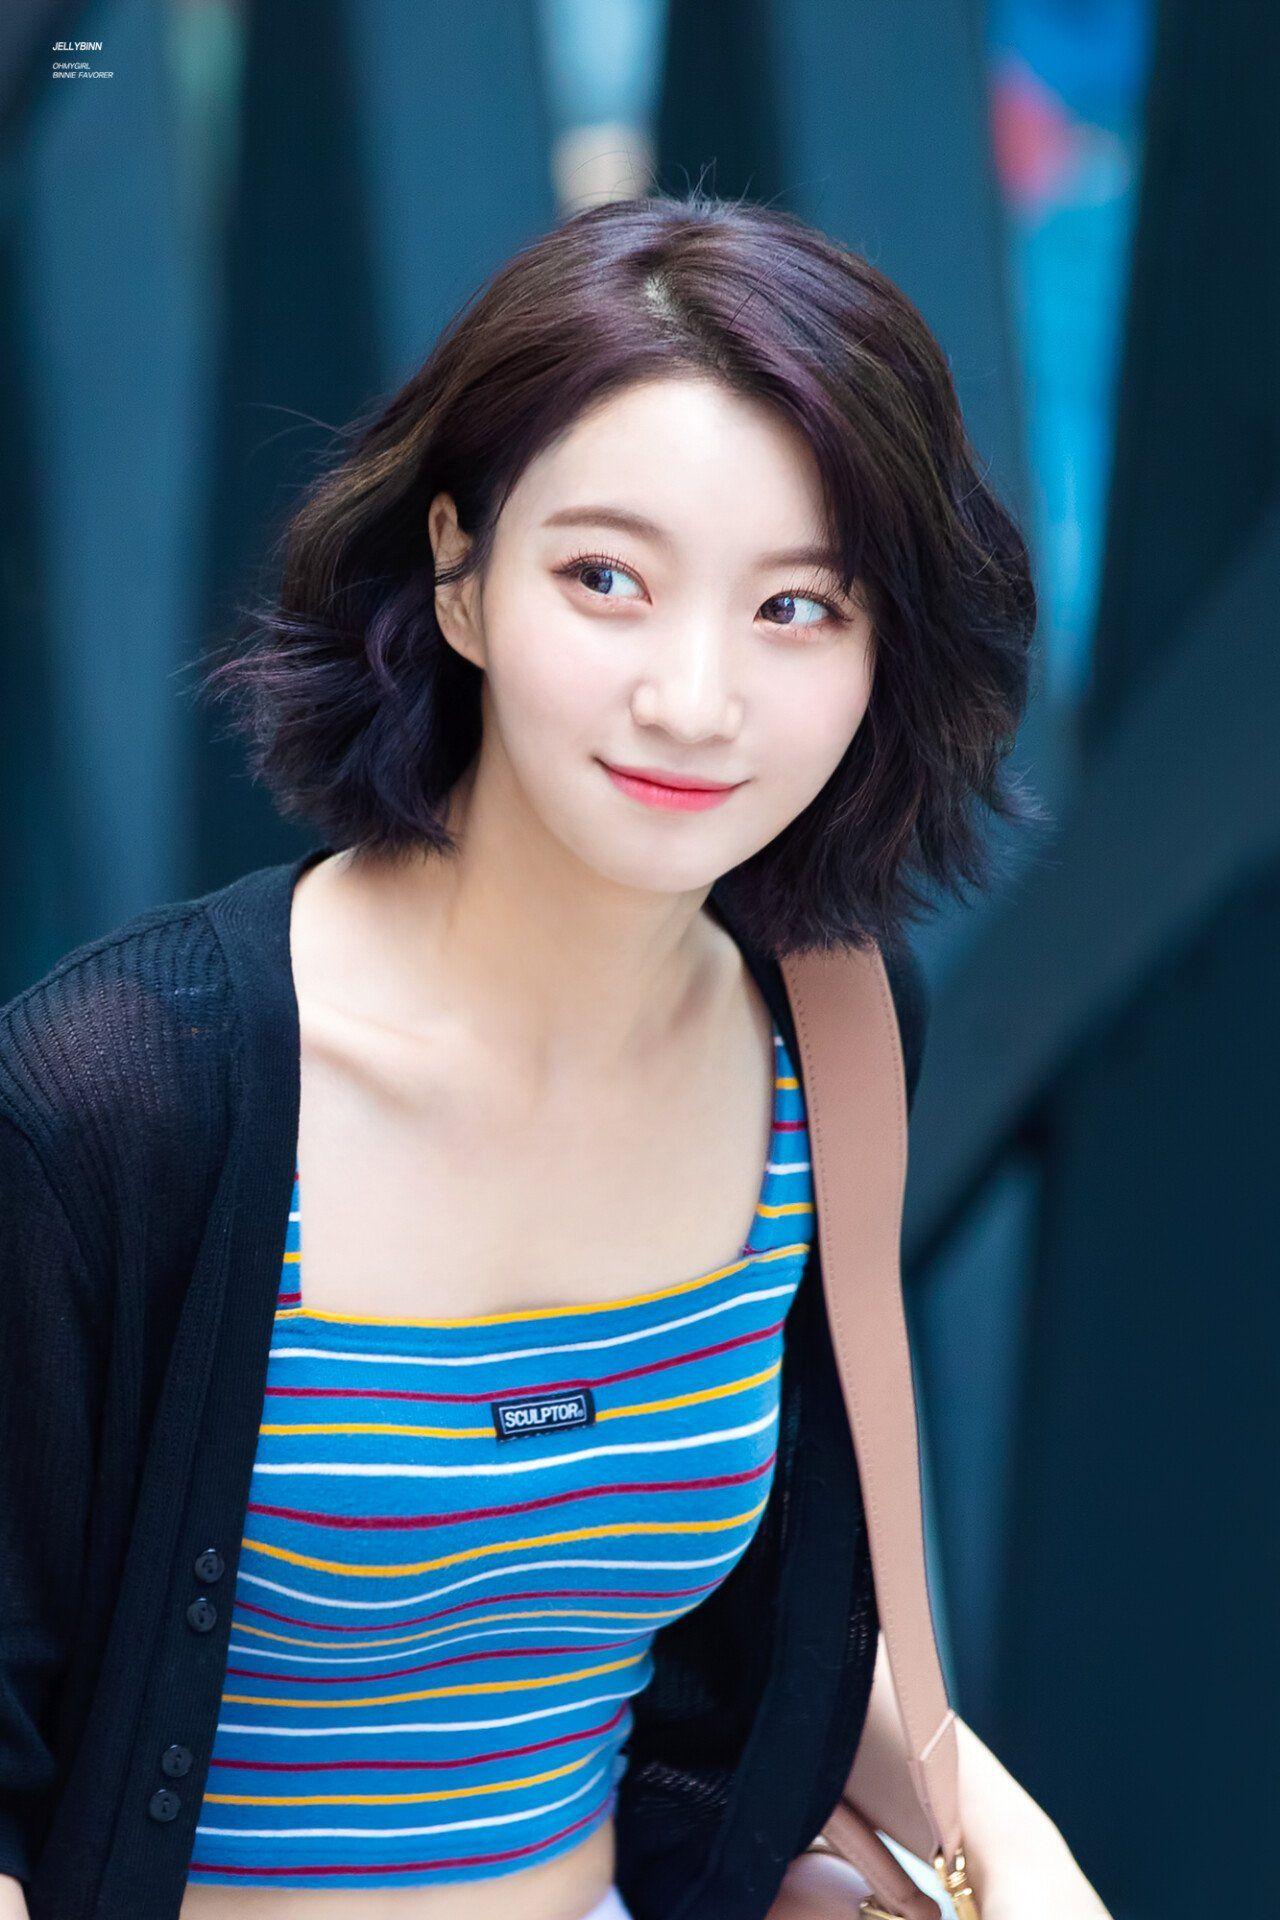 ㅈㅆㅈㅇ - 걸그룹 갤러리 - 에펨코리아 | Güzel kadınlar, Kadın